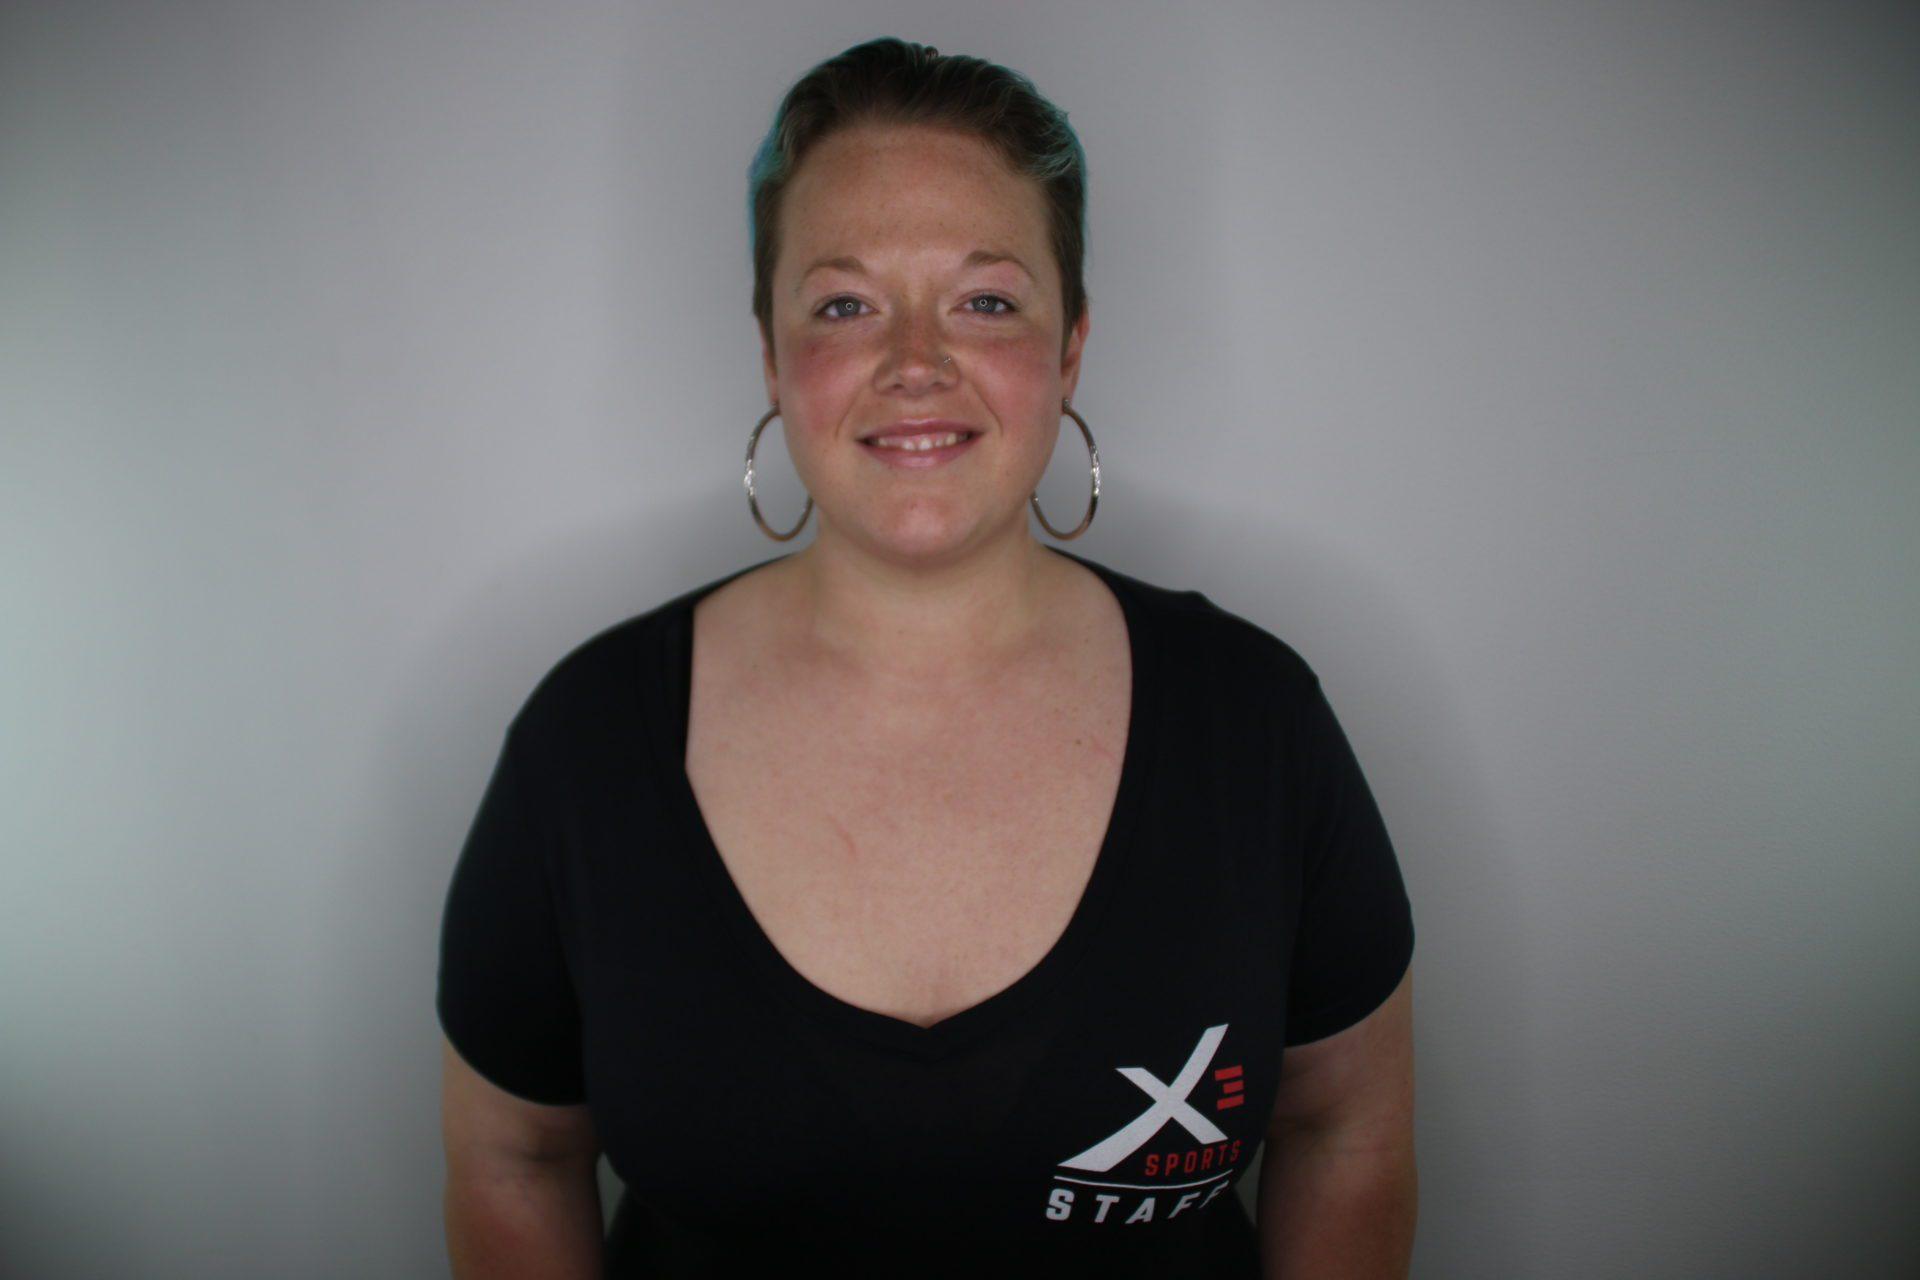 Jessica Oteka | X3 Sports Employee | X3 Sports